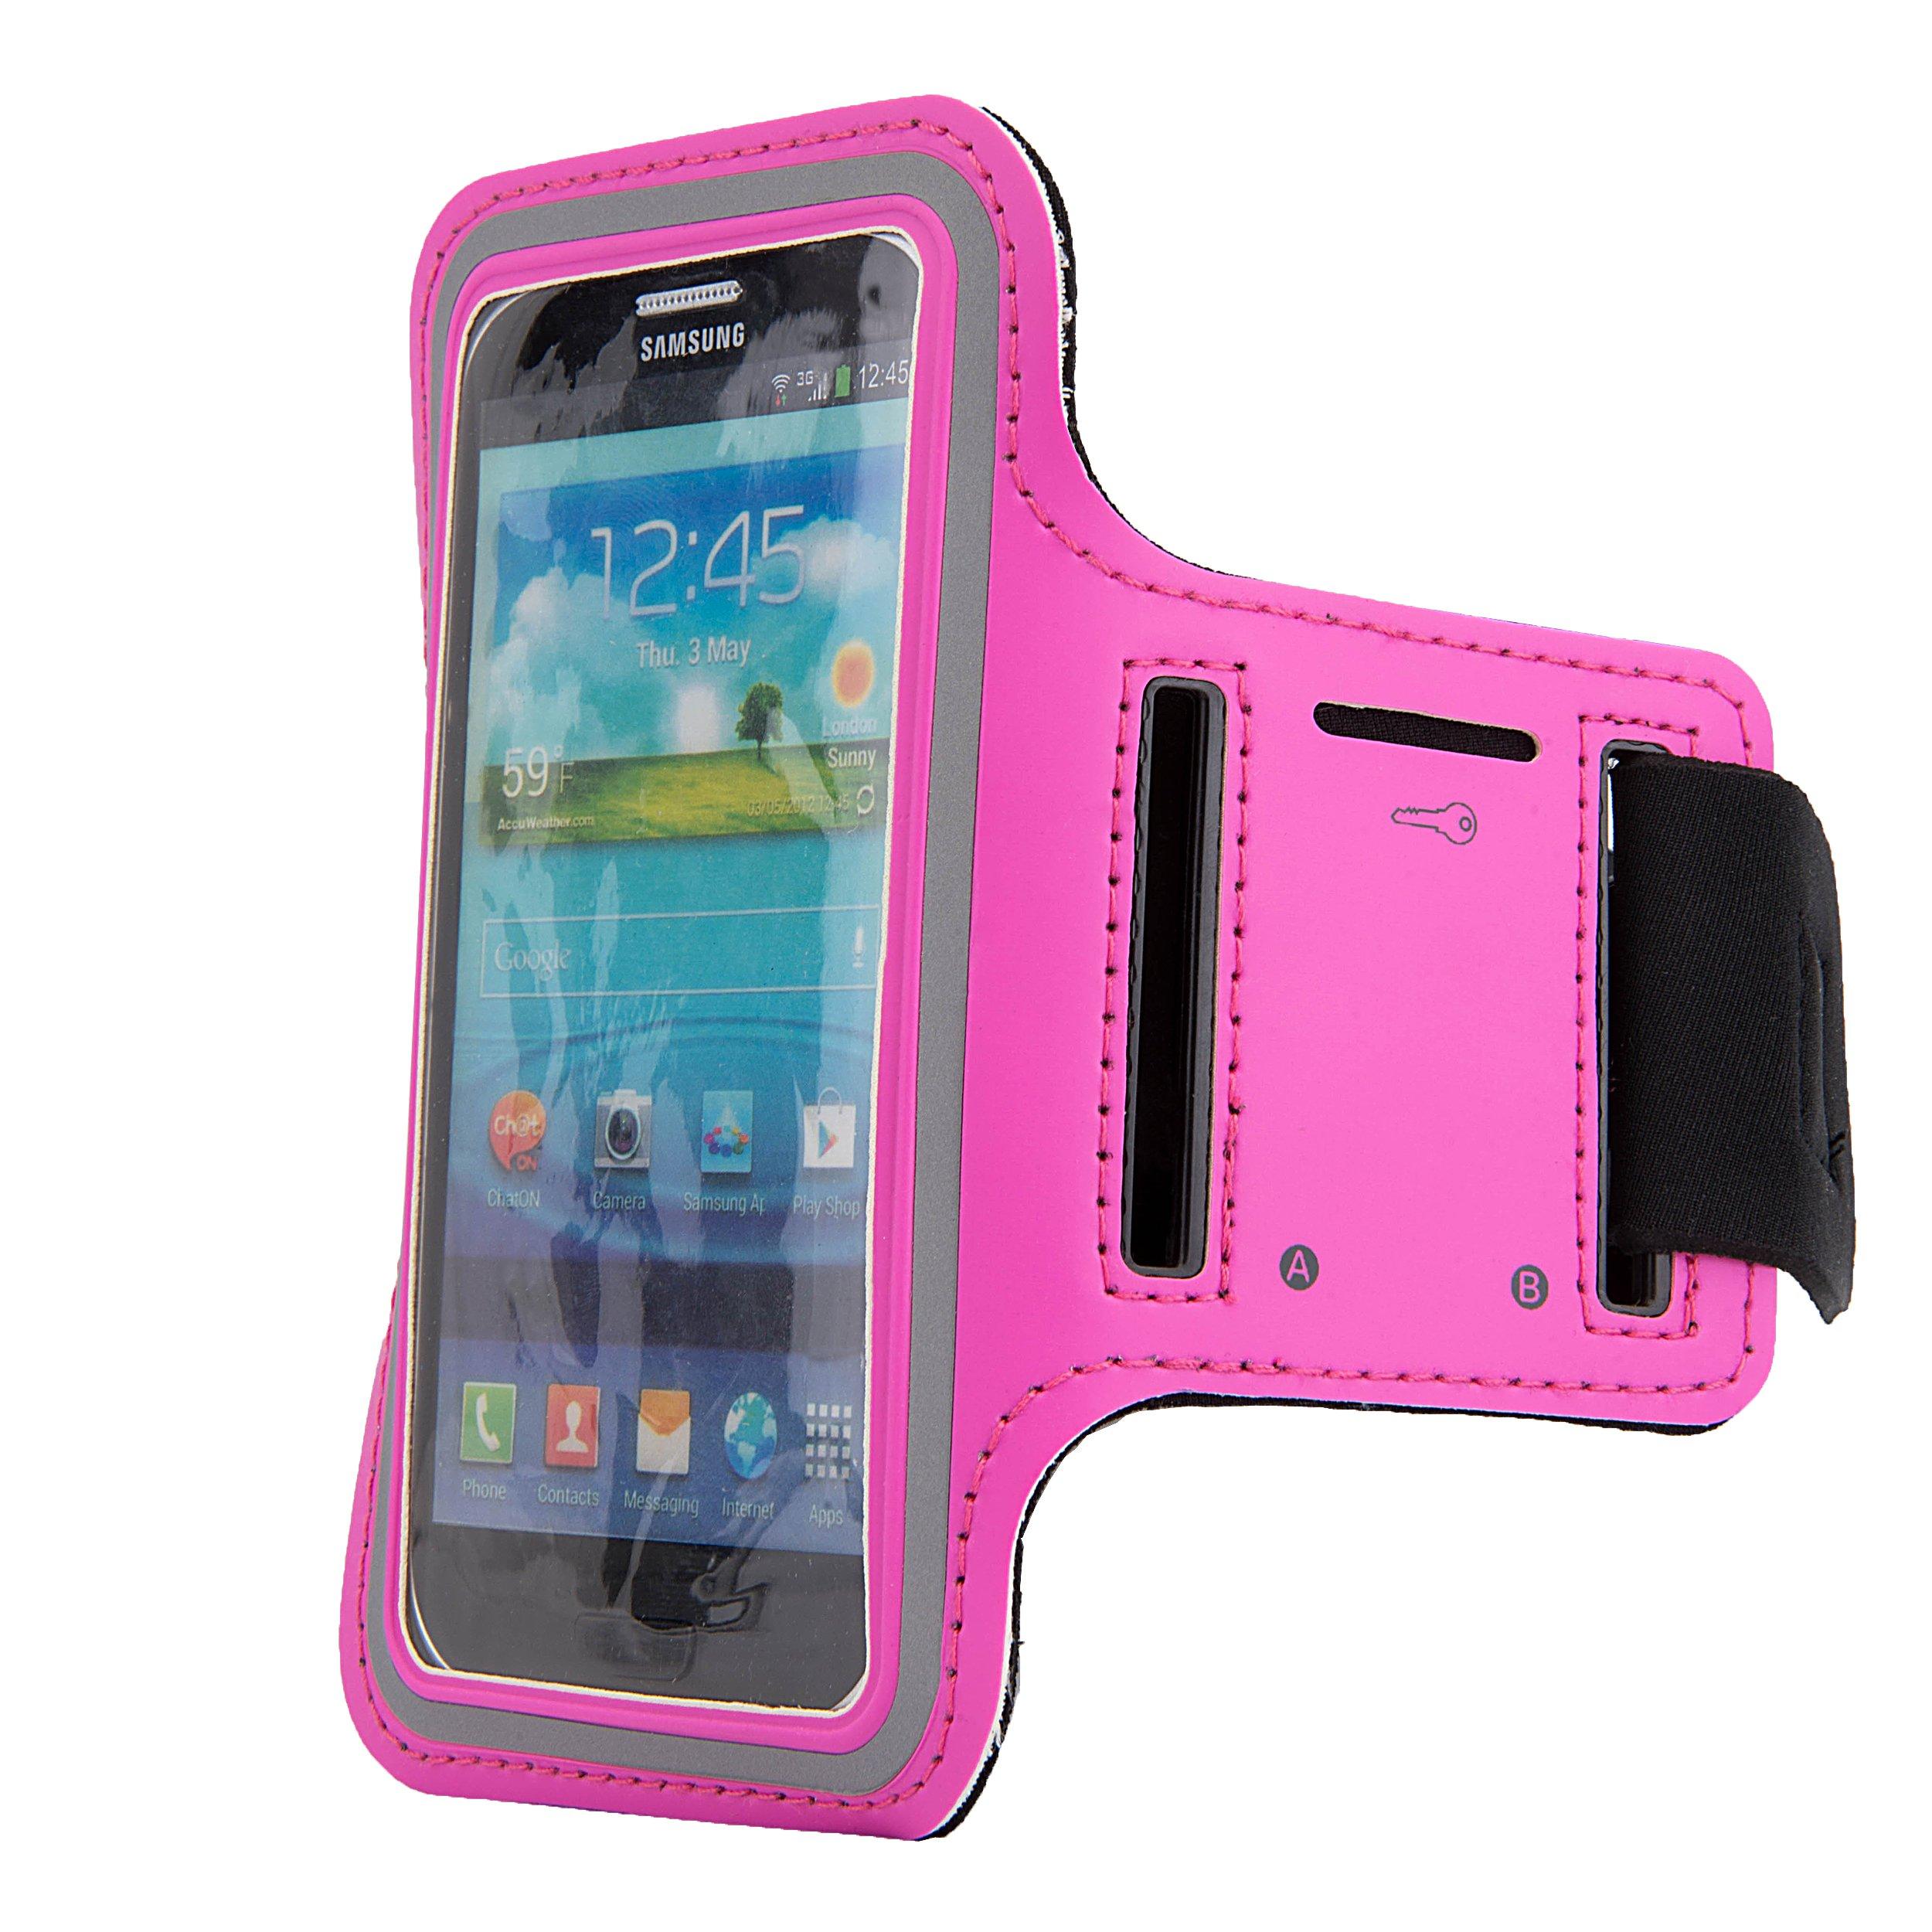 SumacLife Workout Smartphone Armband with Key Slot for iPhone 5s/Z3/Lumia/Moto - Rose